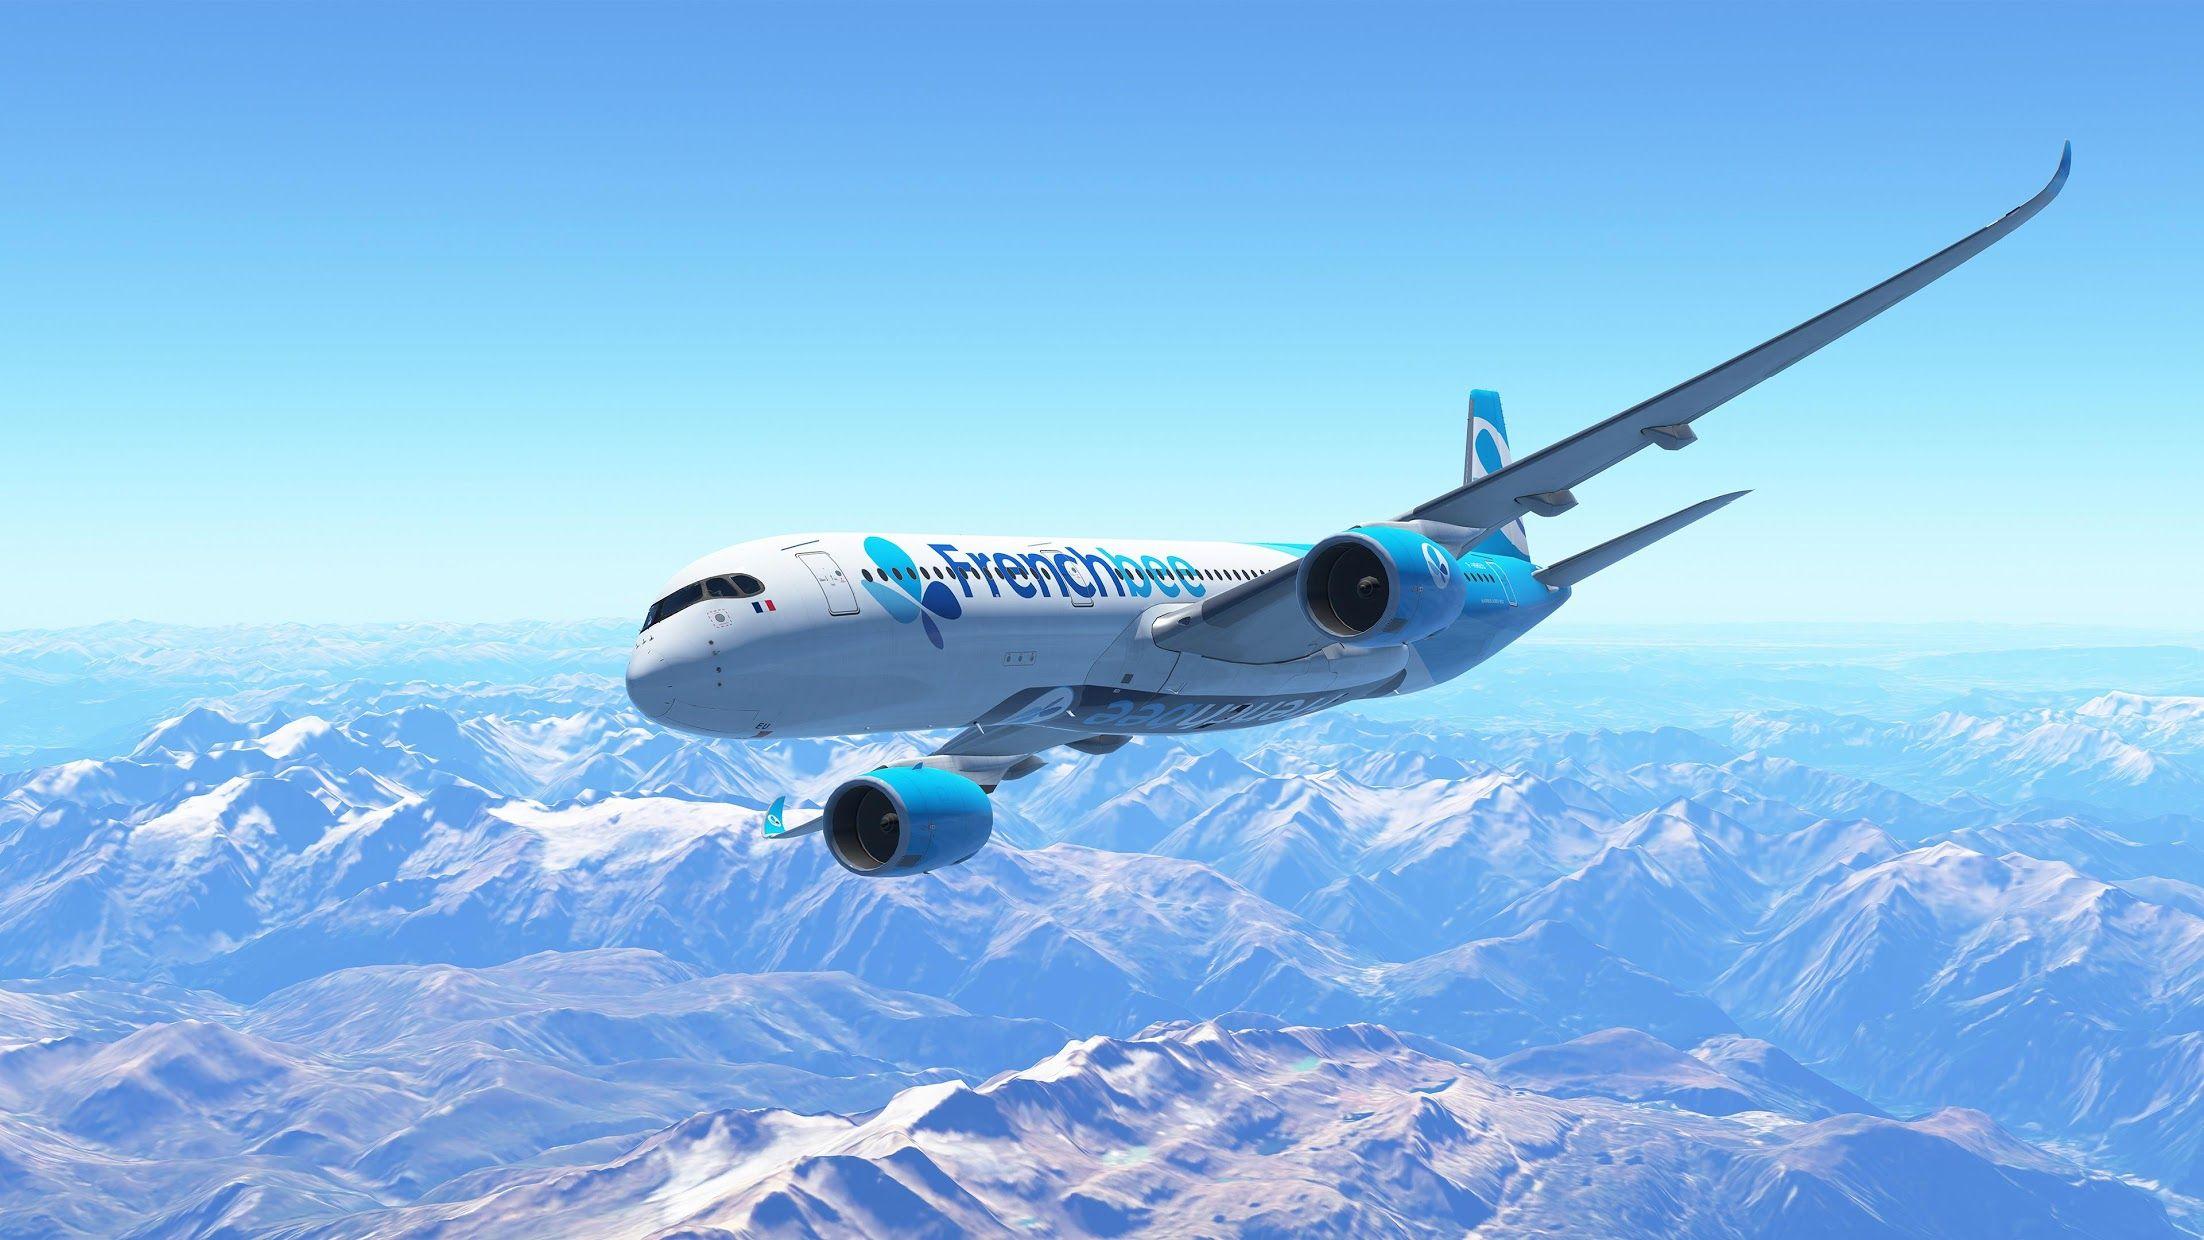 Infinite Flight-飞行模拟器 游戏截图1